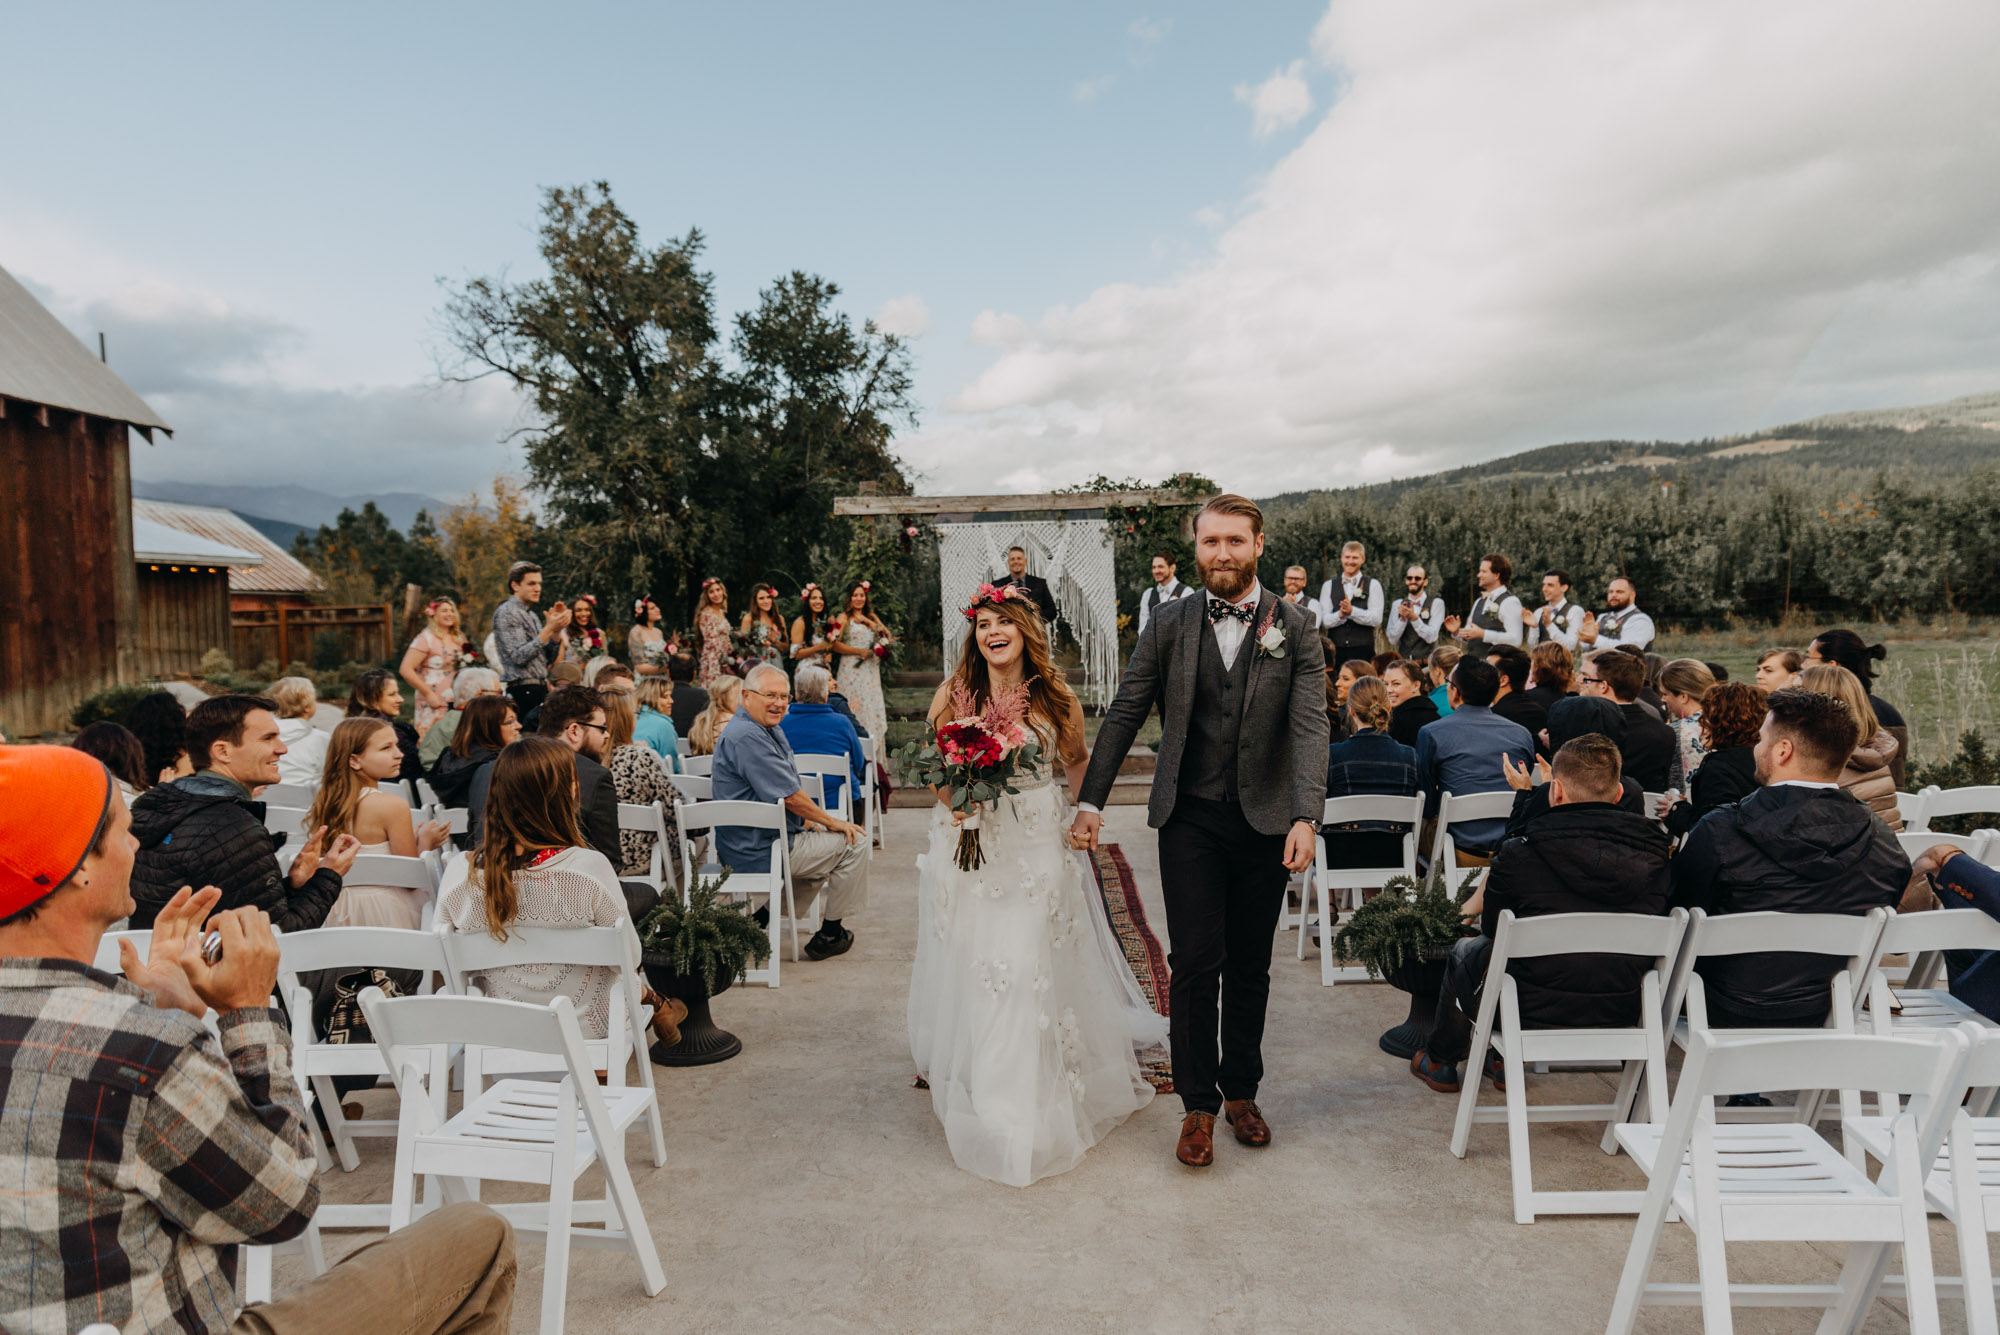 Outdoor-Summer-Ceremony-Washington-Wedding-Rainbow-5449.jpg